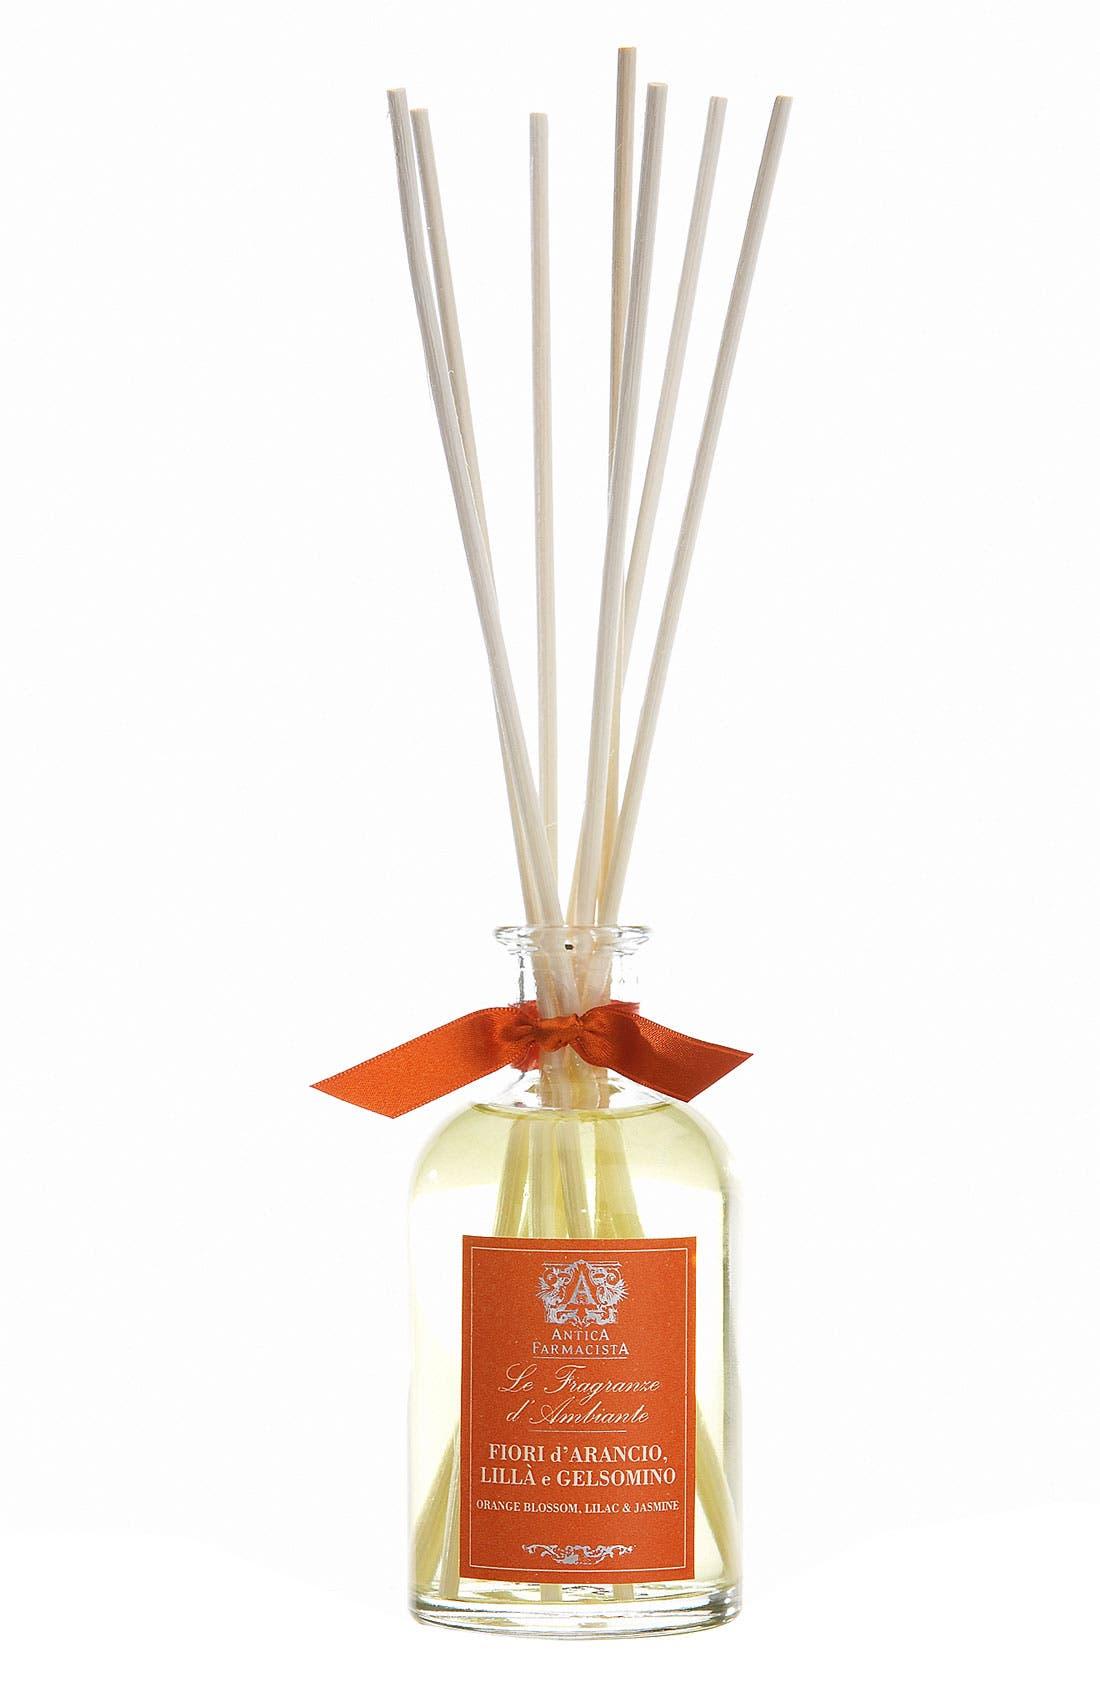 Antica Farmacista Orange Blossom, Lilac & Jasmine Home Ambiance Perfume (3.3 oz.)